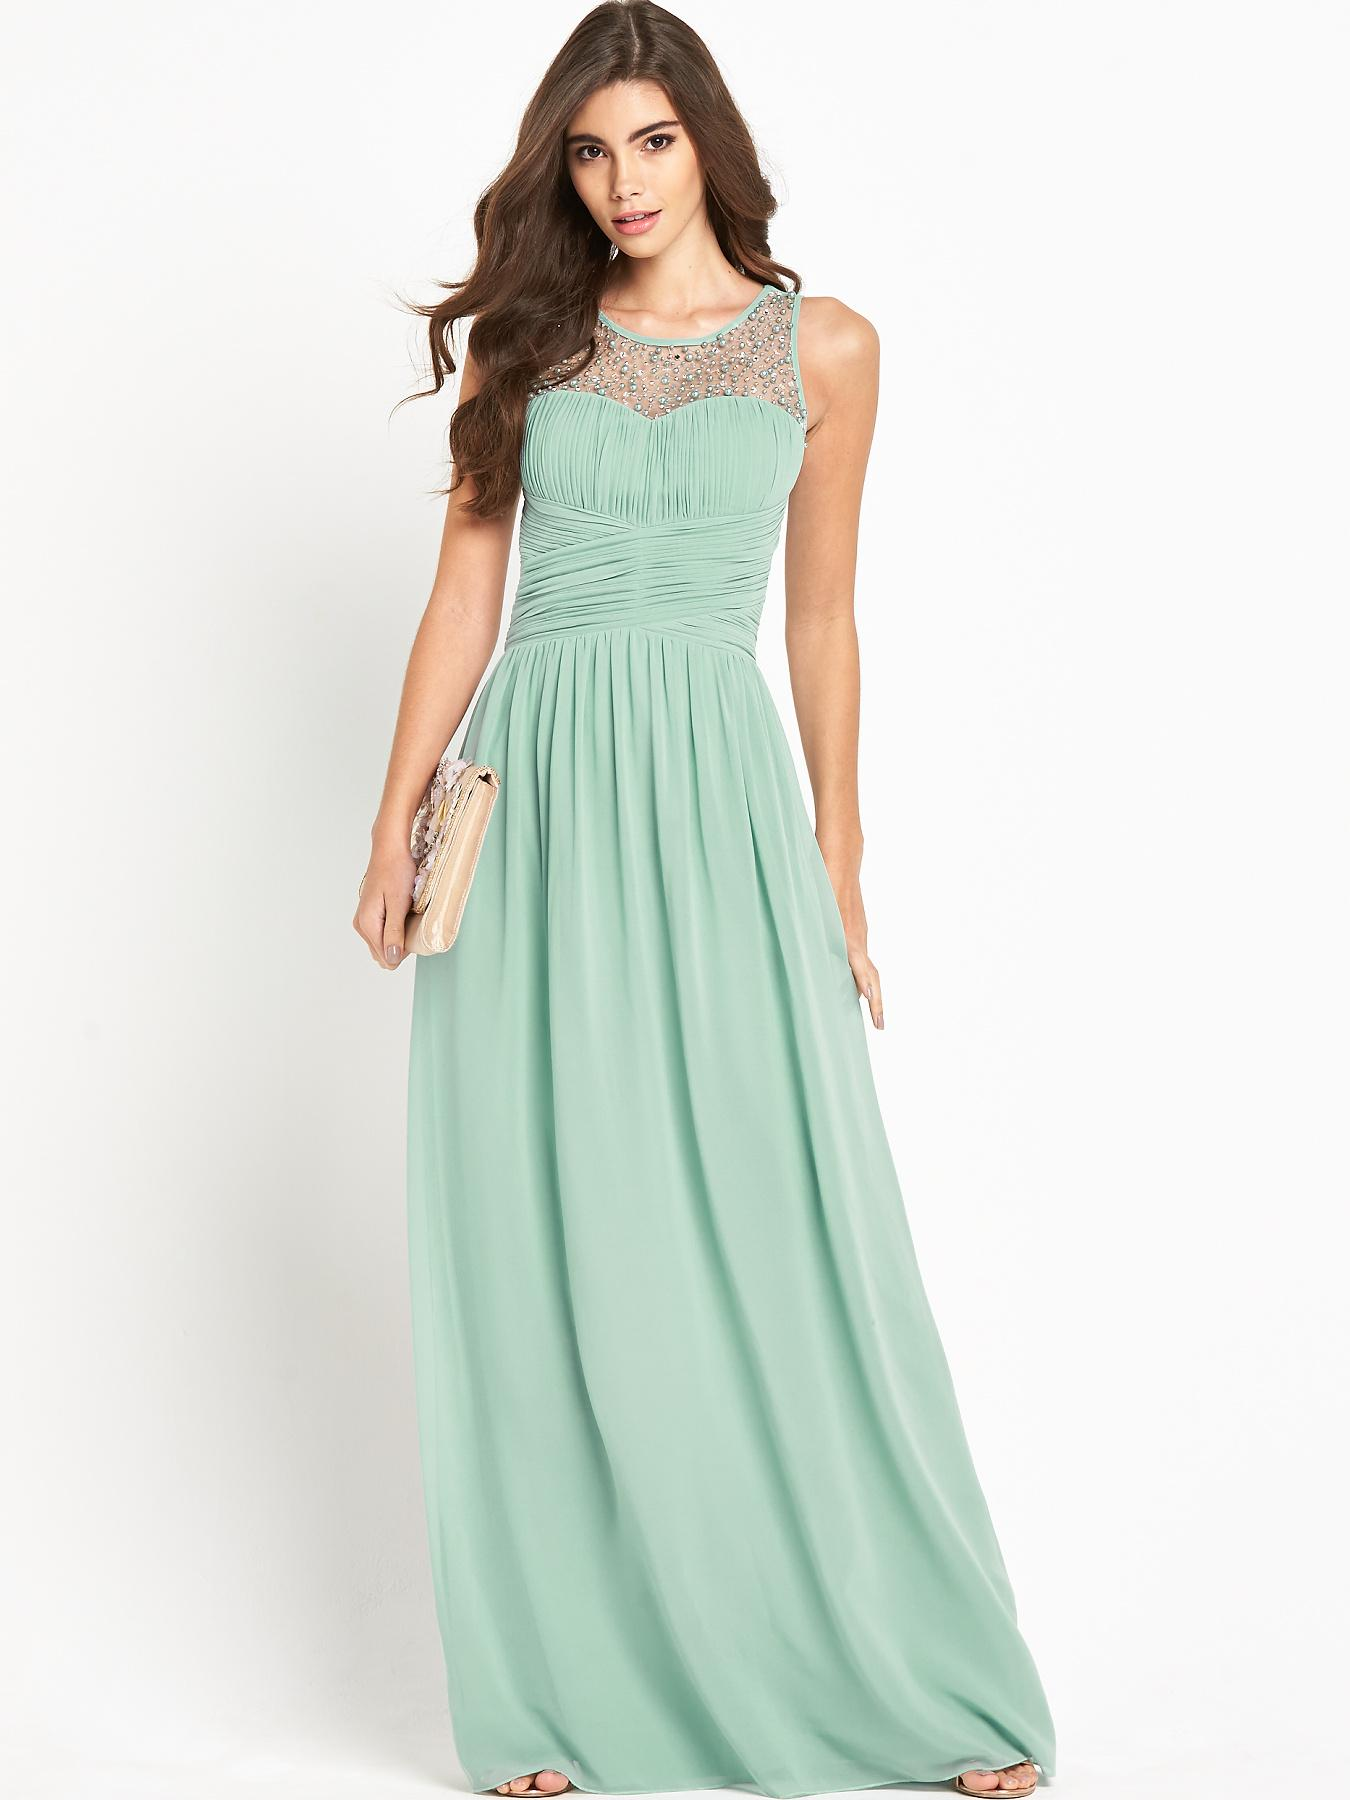 Dorable High Street Prom Dresses Uk Ensign - Wedding Dress Ideas ...